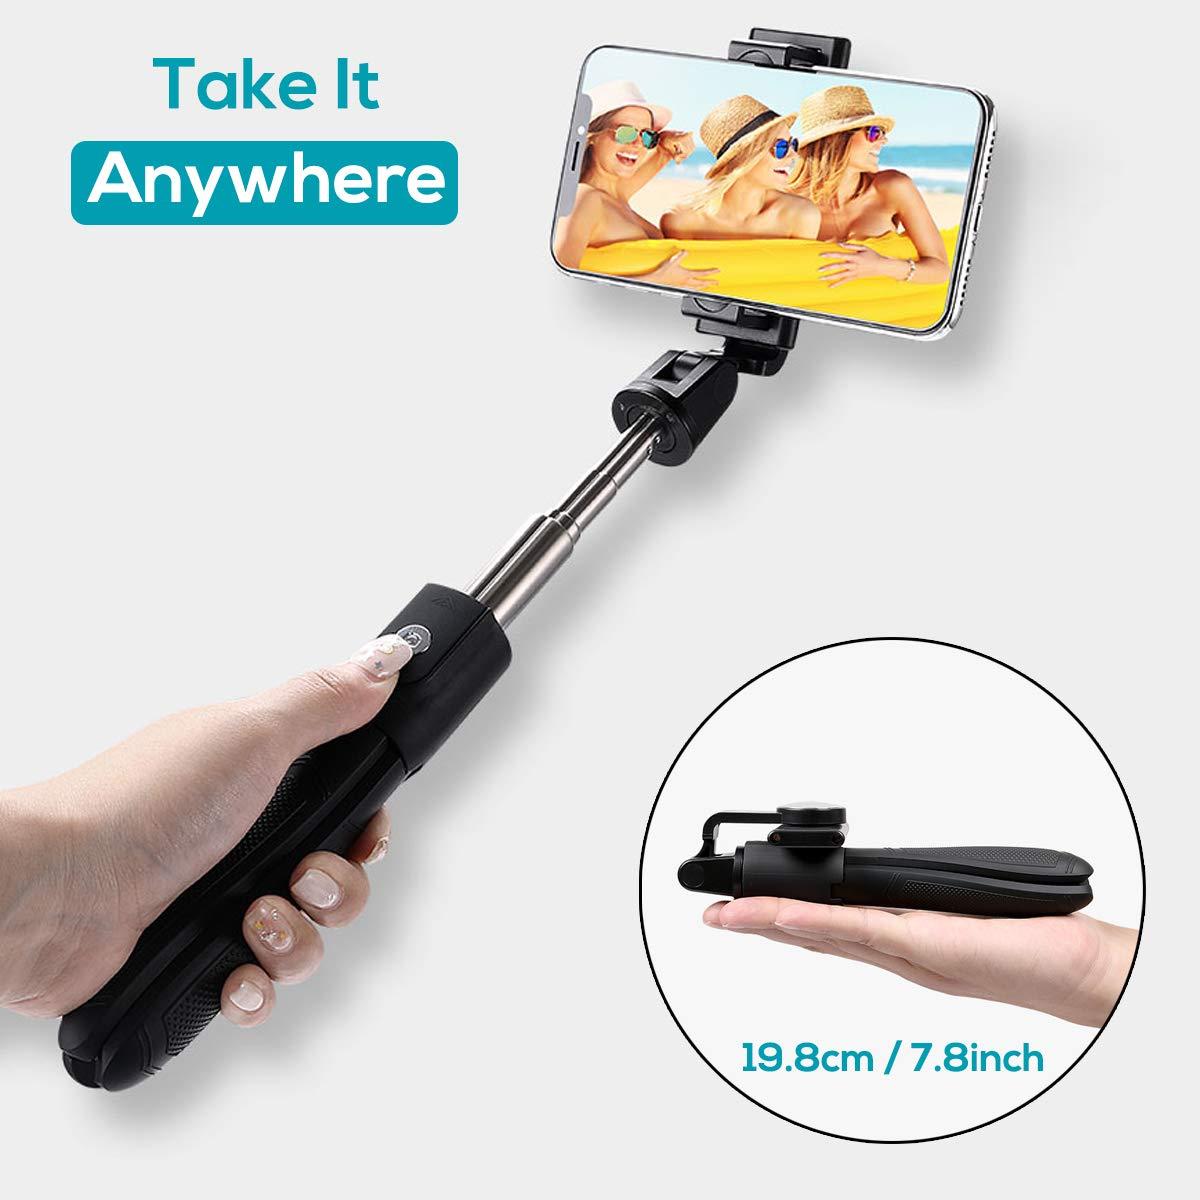 LATEC Palo Selfie Trípode, Selfie Stick Extensible con Mando a Distancia Inalámbrico por Bluetooth para Móviles de 3.5 a 6 Pulgadas como iPhone, ...